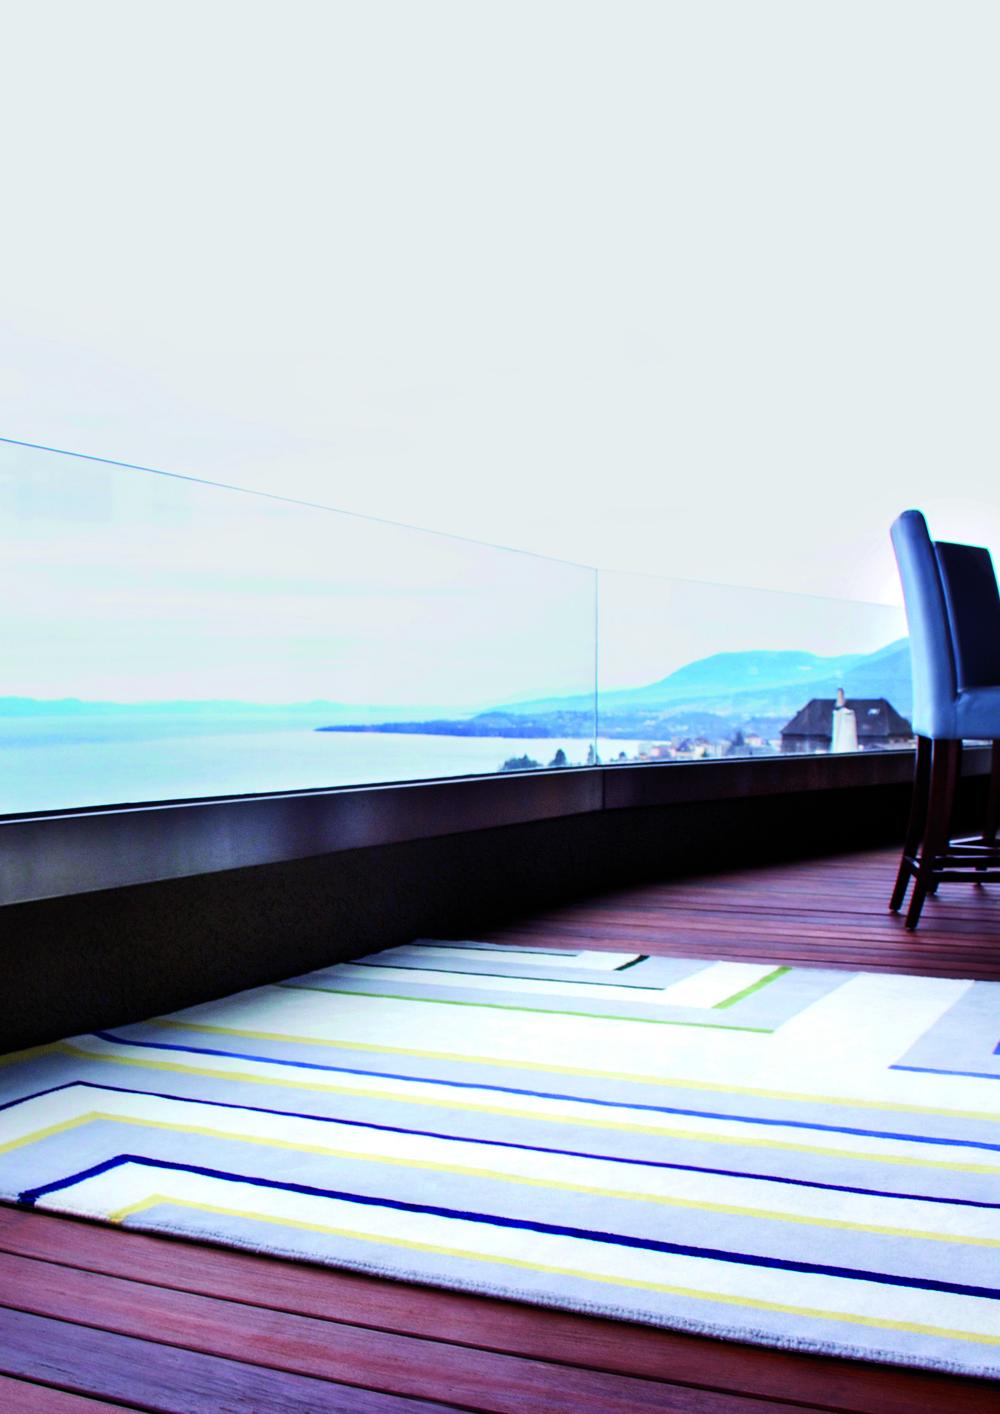 Cecilia-Setterdahl-CarpetsCC-Canvas-Carpets-Cushions-Carpet-Sunrise-2016.jpg